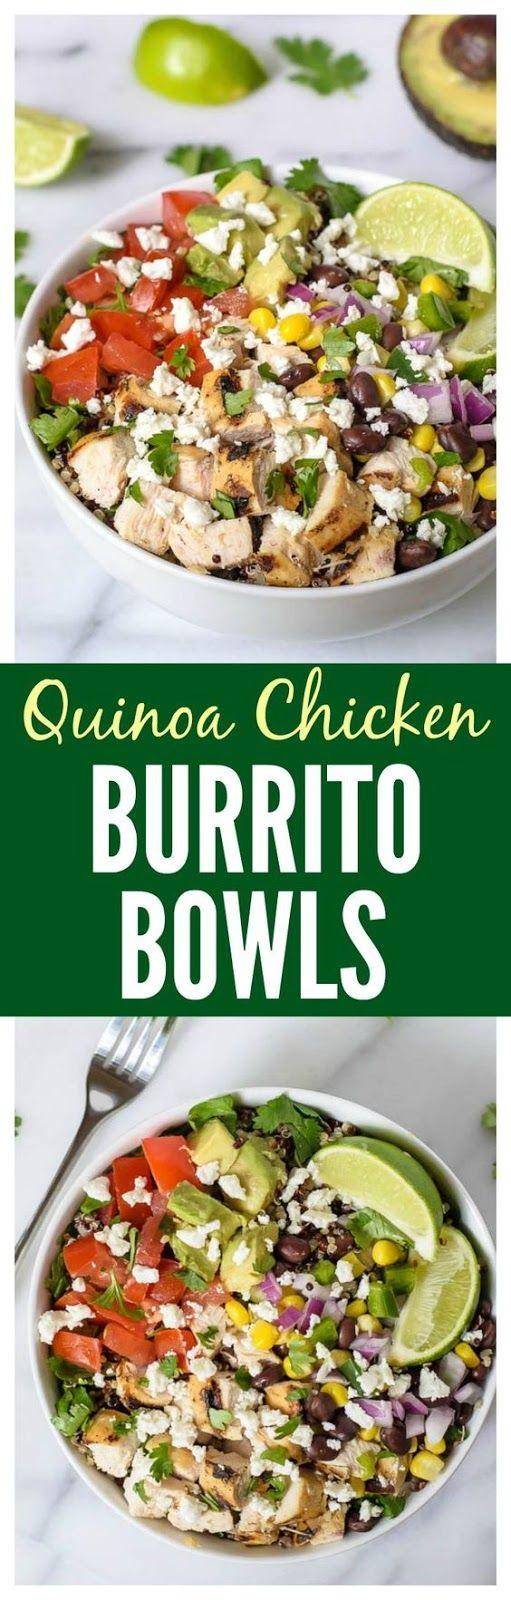 Chipotle Burrito Bowls with Chicken, Quinoa, and Avocado | Food And Cake Recipes